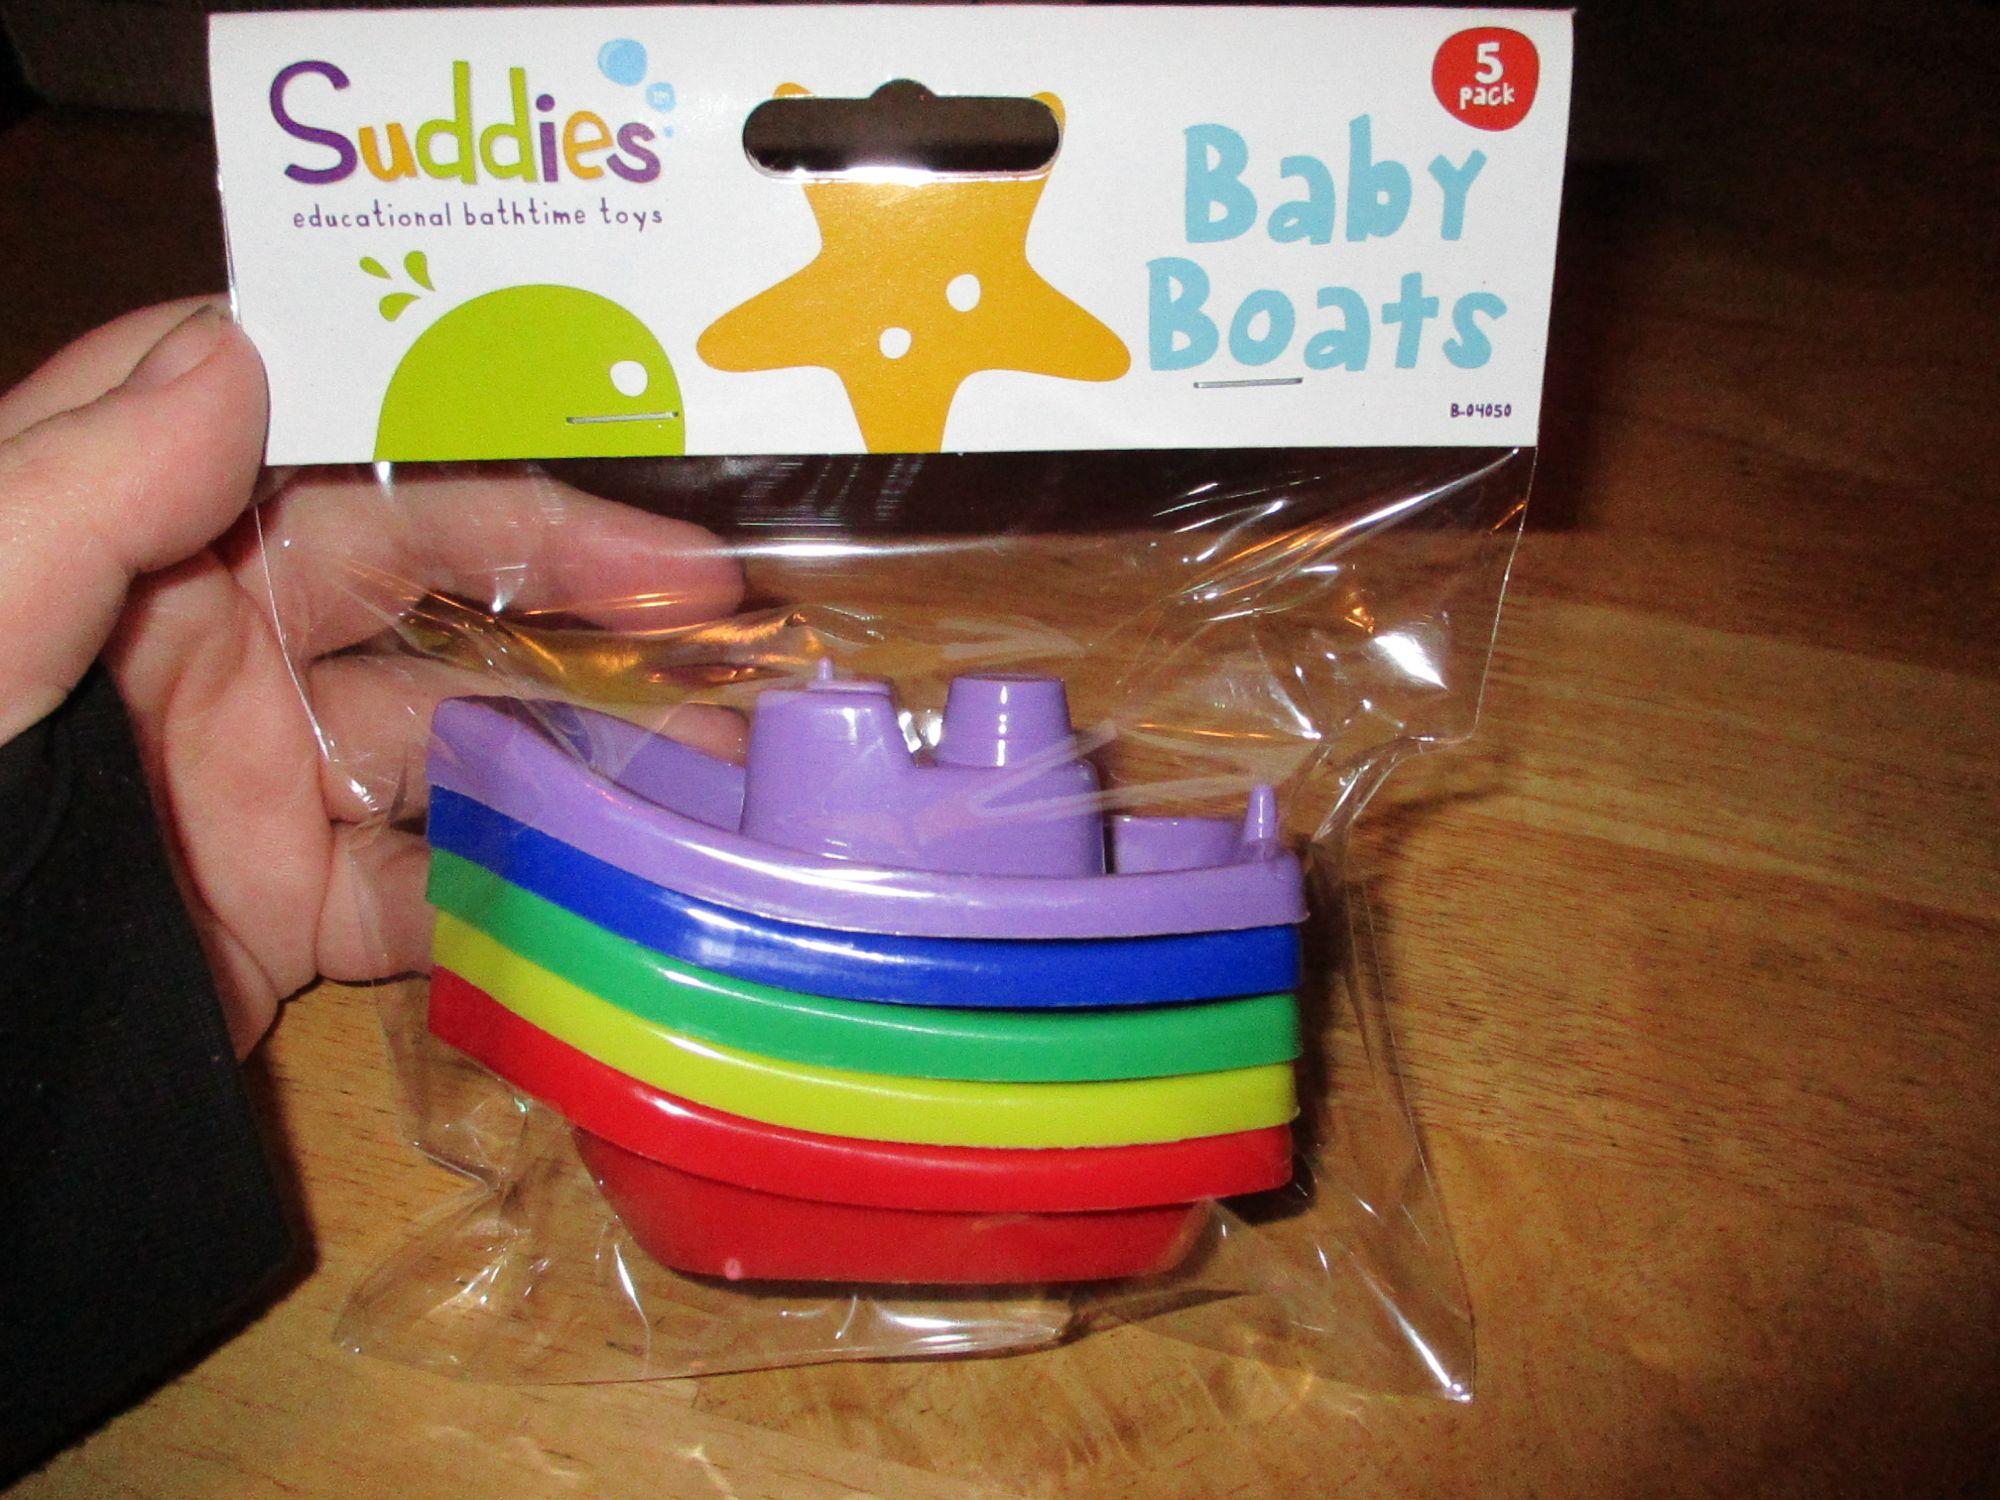 5pk Plastic Bath Boats - Suddies Education Bathtime Toys | eBay